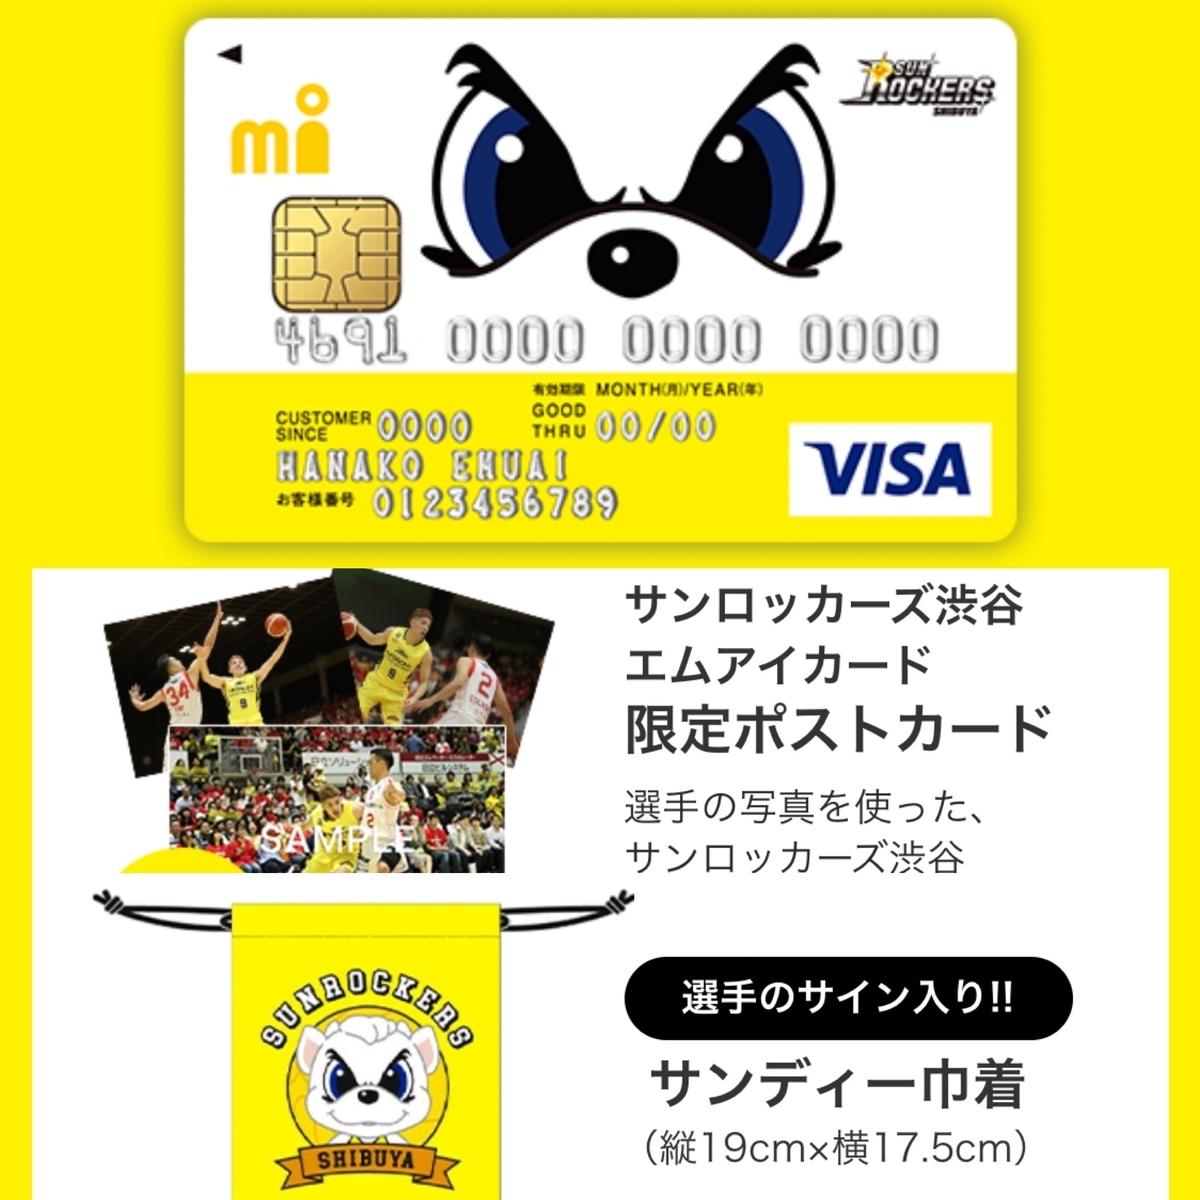 Bリーグ クレジットカード サンロッカーズ 渋谷